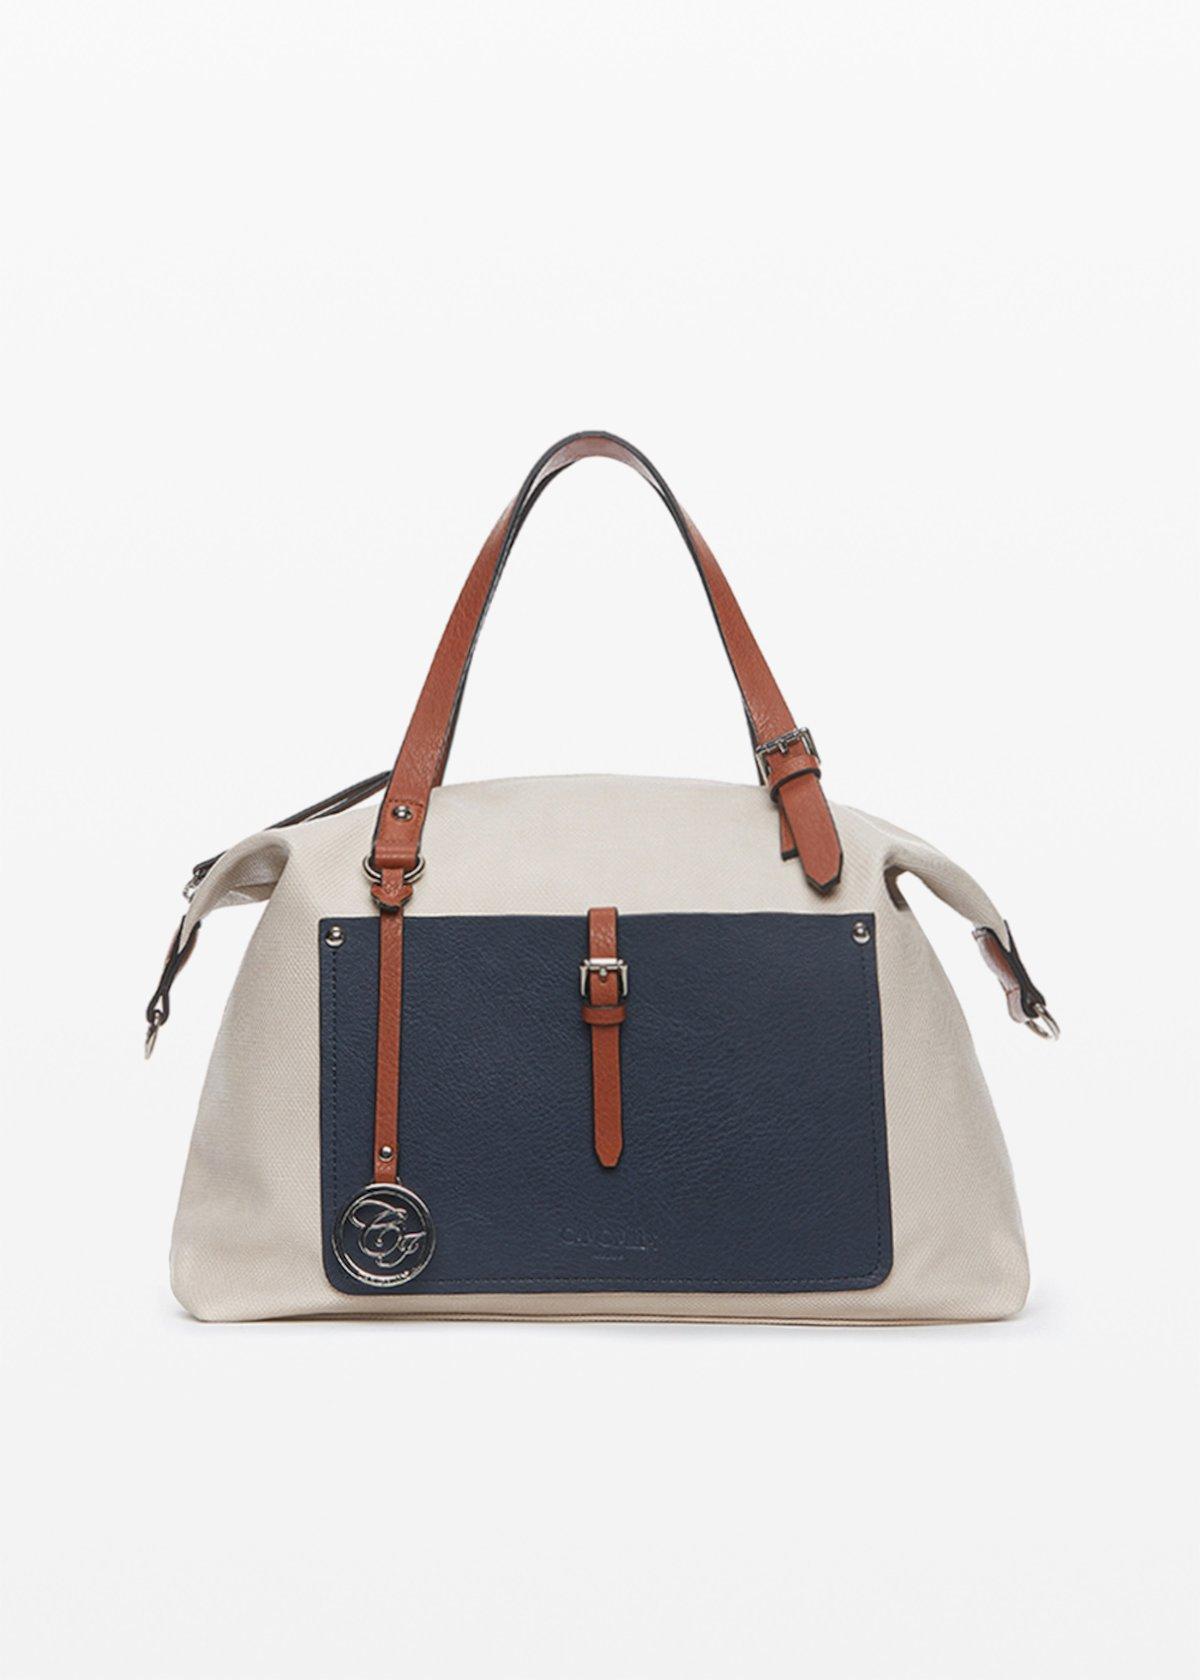 Faux leather Brenda handbag with front pocket - Light Beige /  Medium Blue - Woman